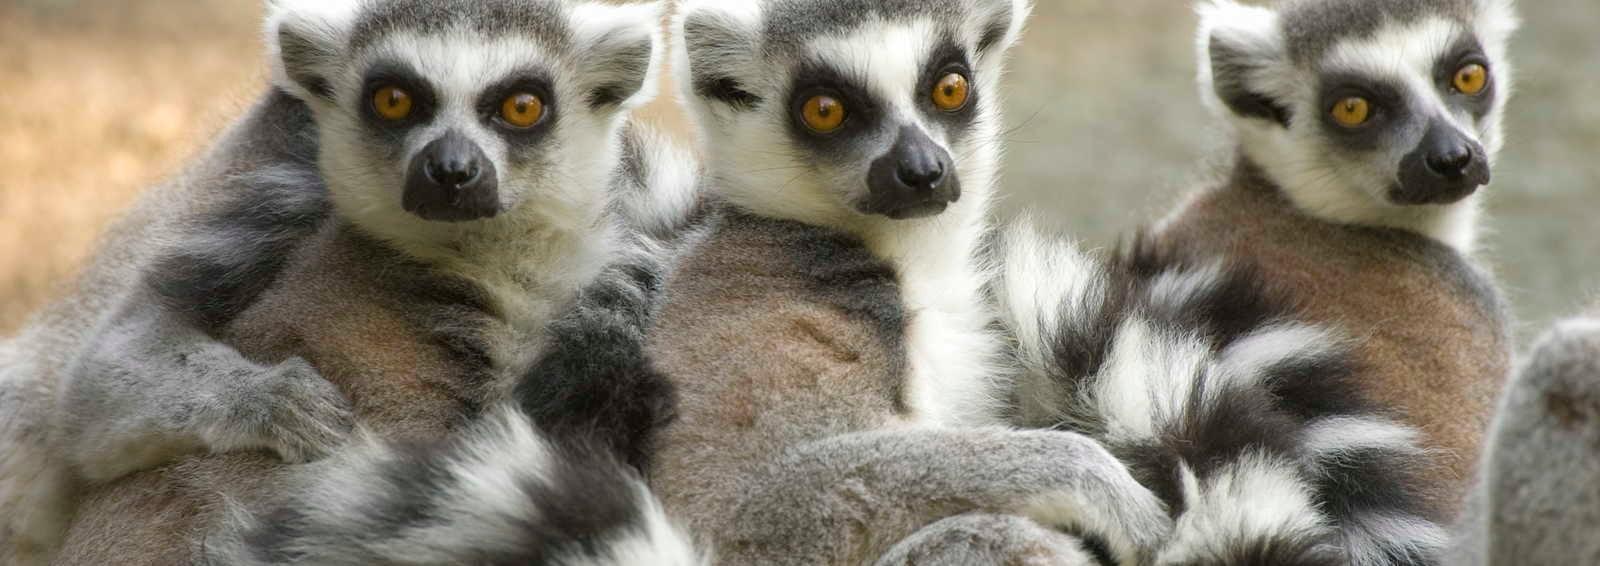 Ring-tailed lemurs, Madagascar